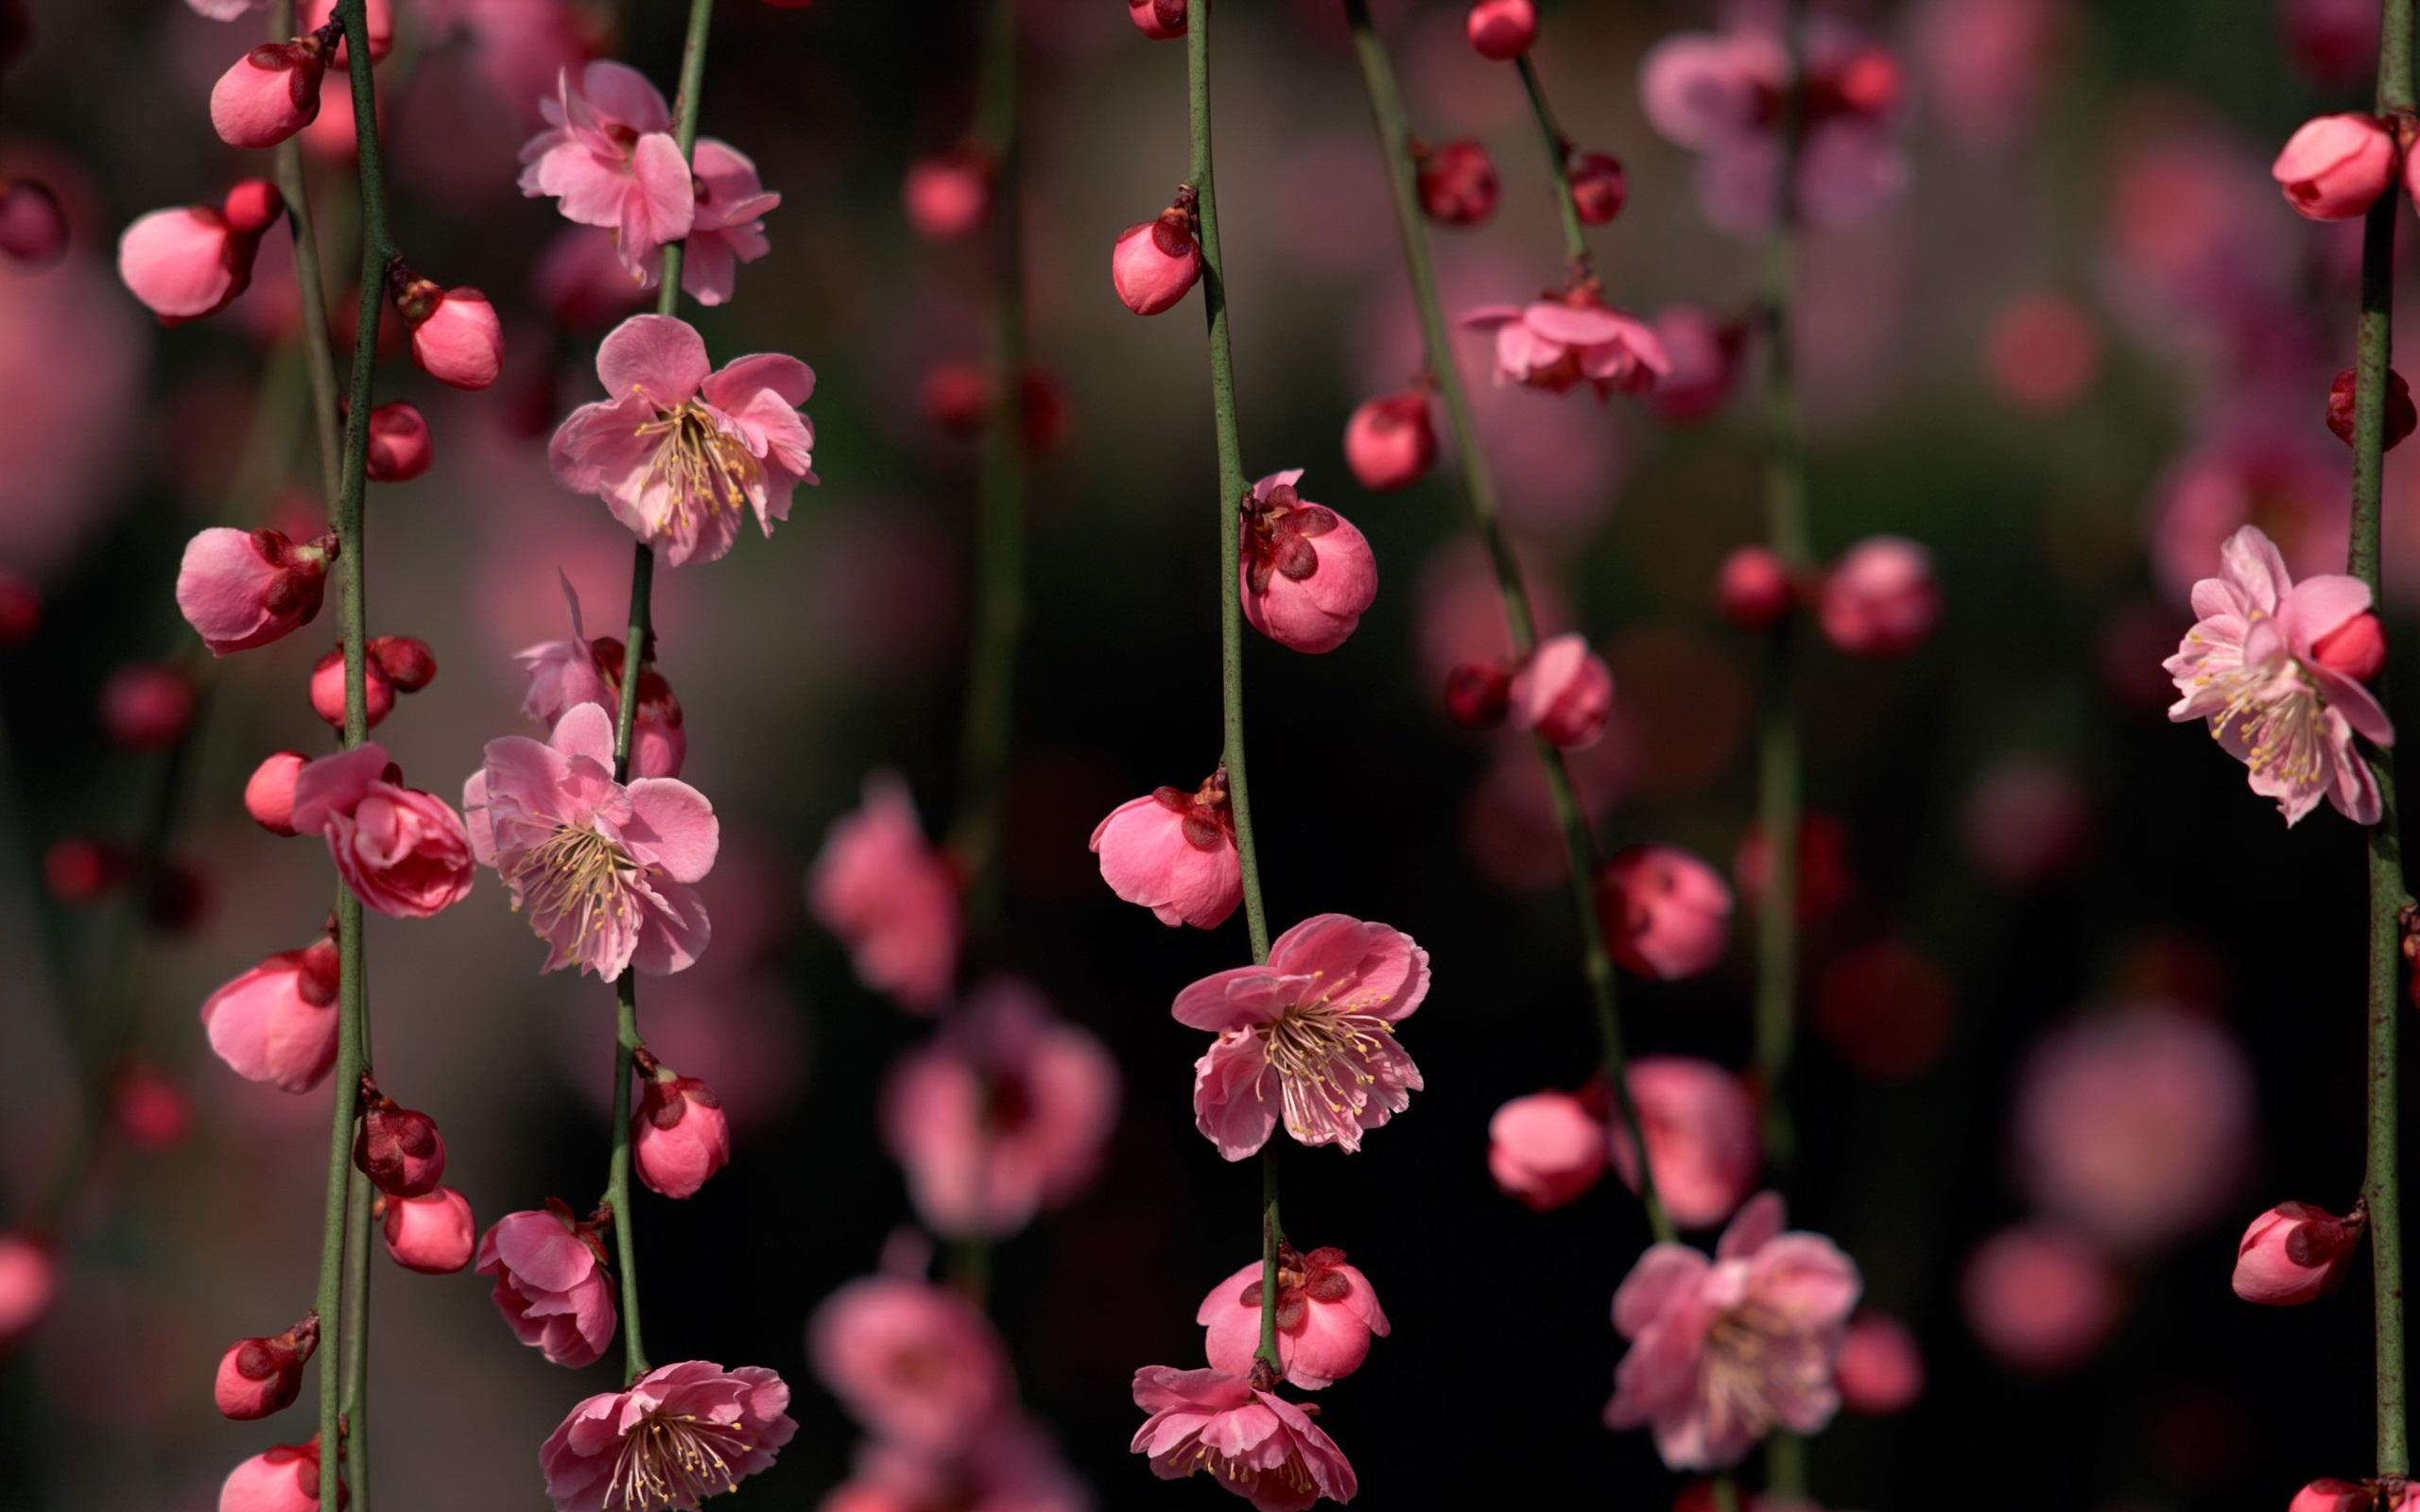 День матери, картинки цветы сакуры красивые